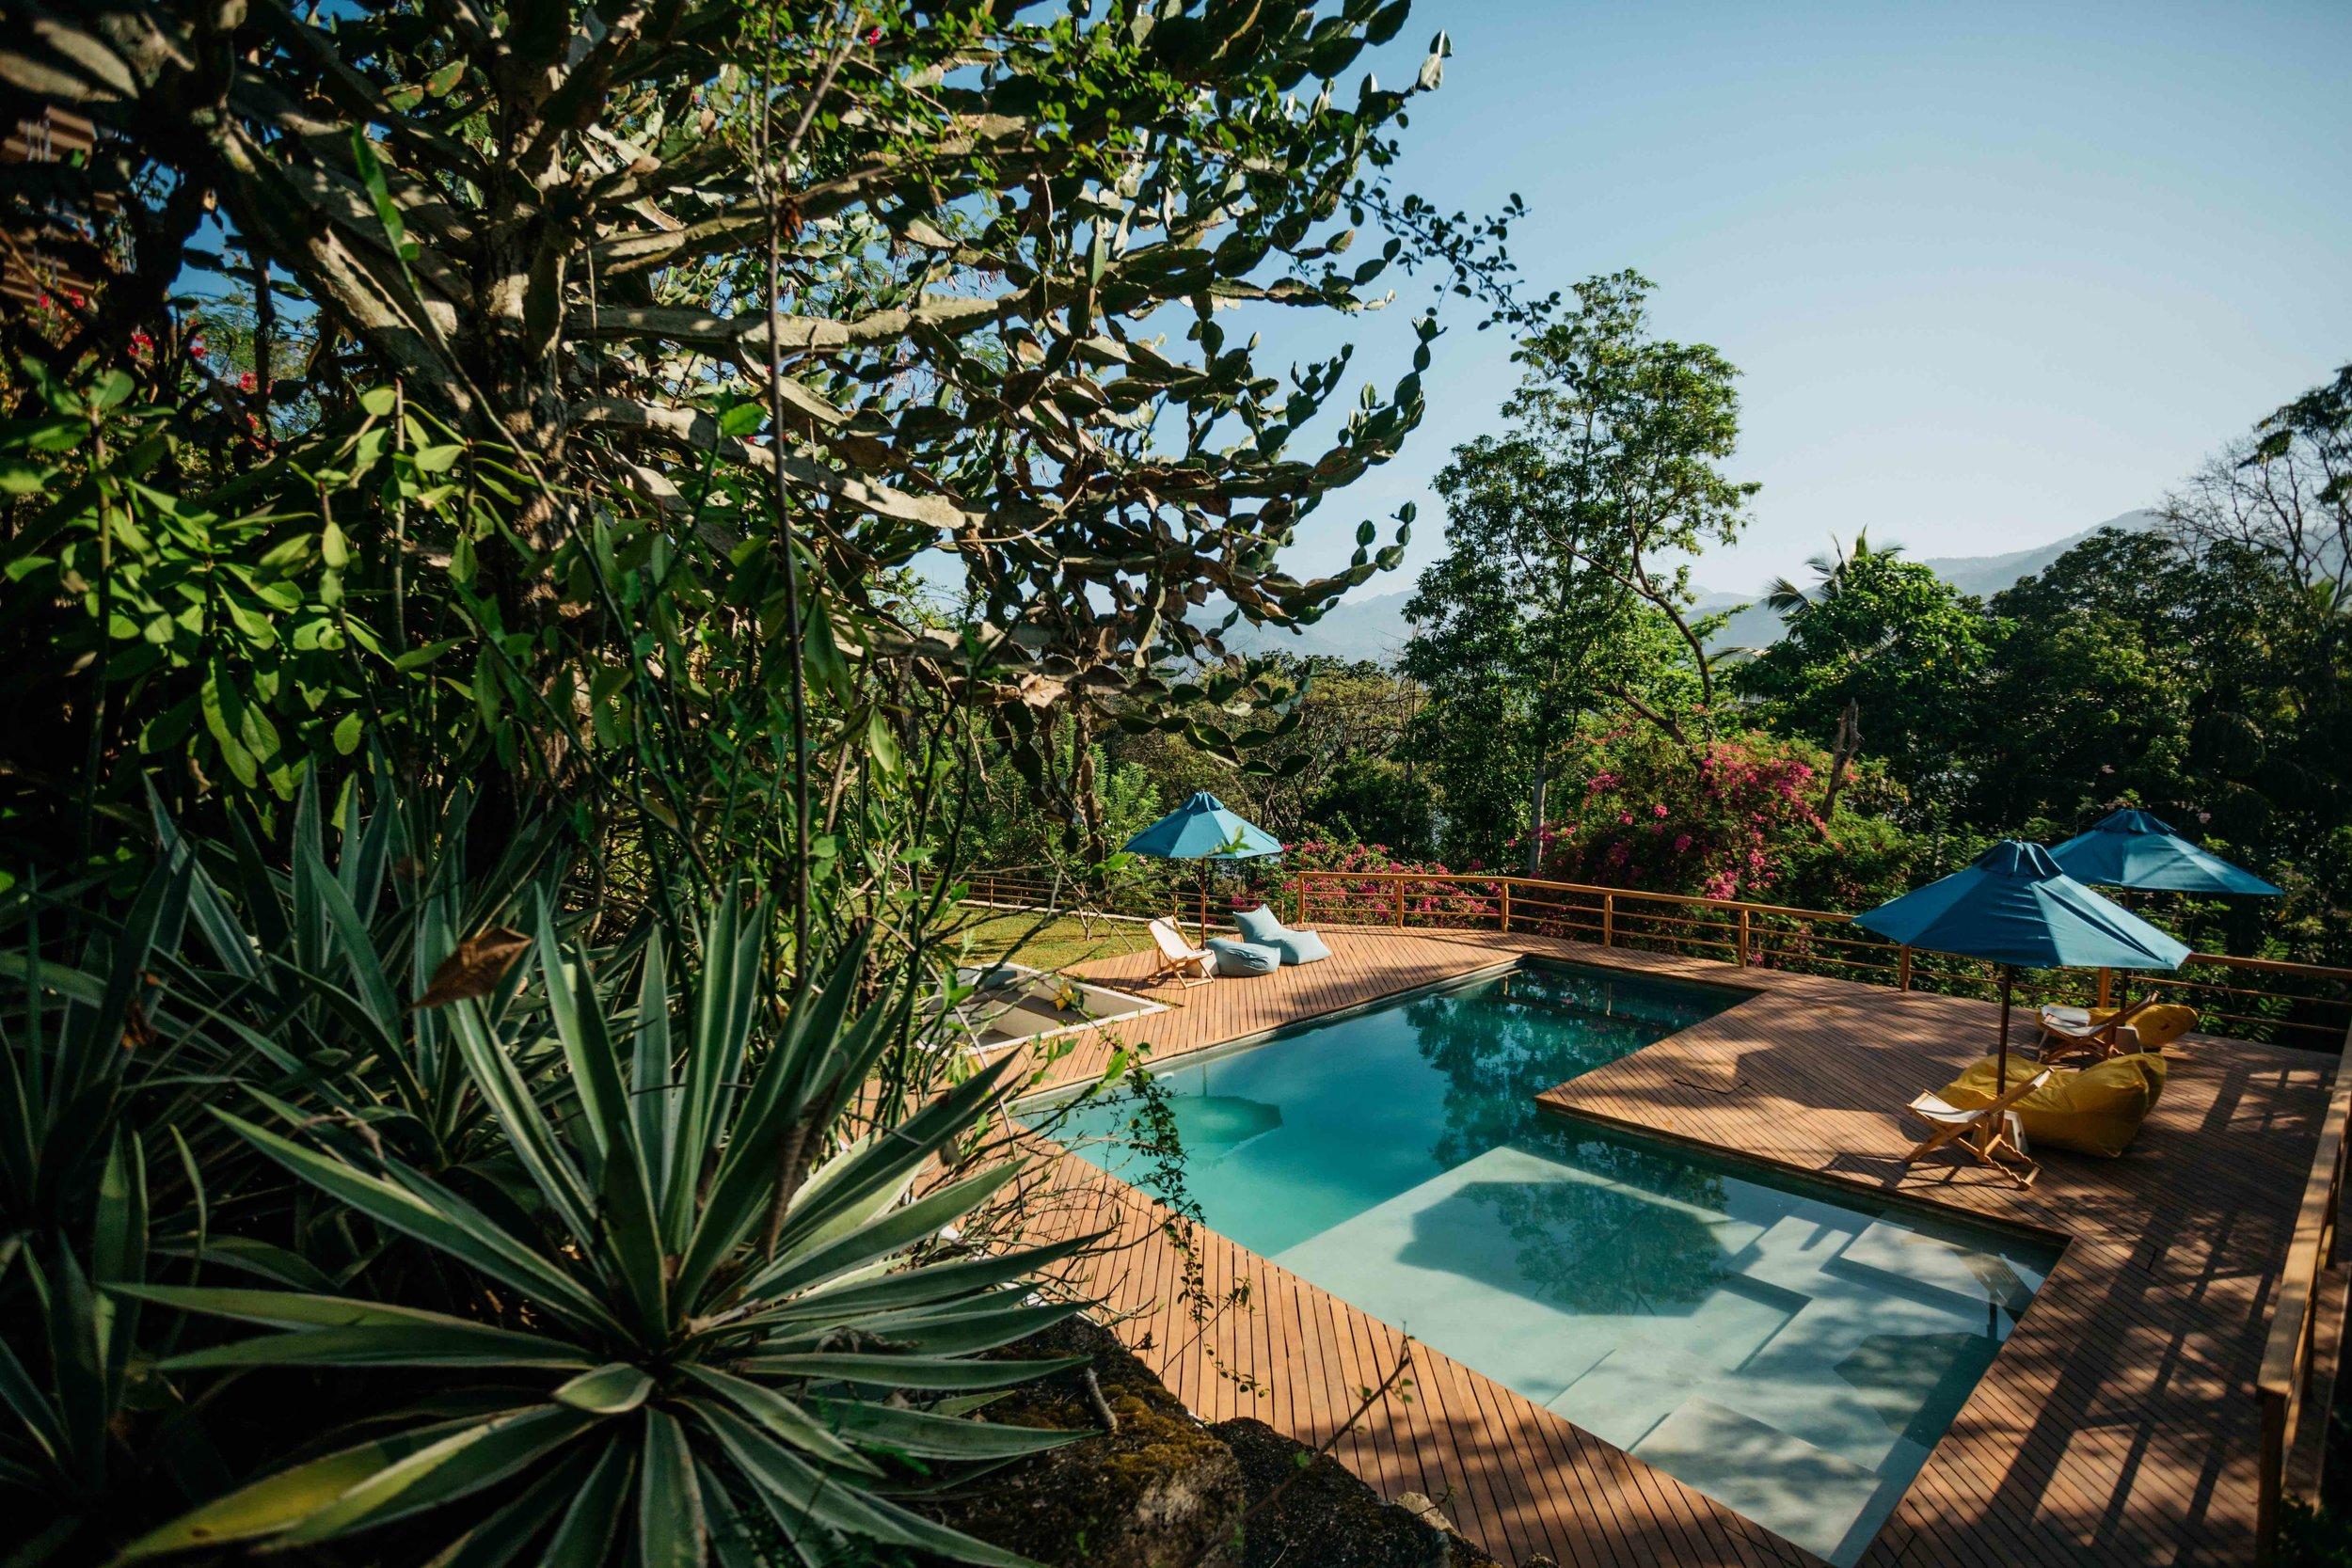 yoga pool retreat kandy colombo city break sri lanka offers deals nature wellness meditation